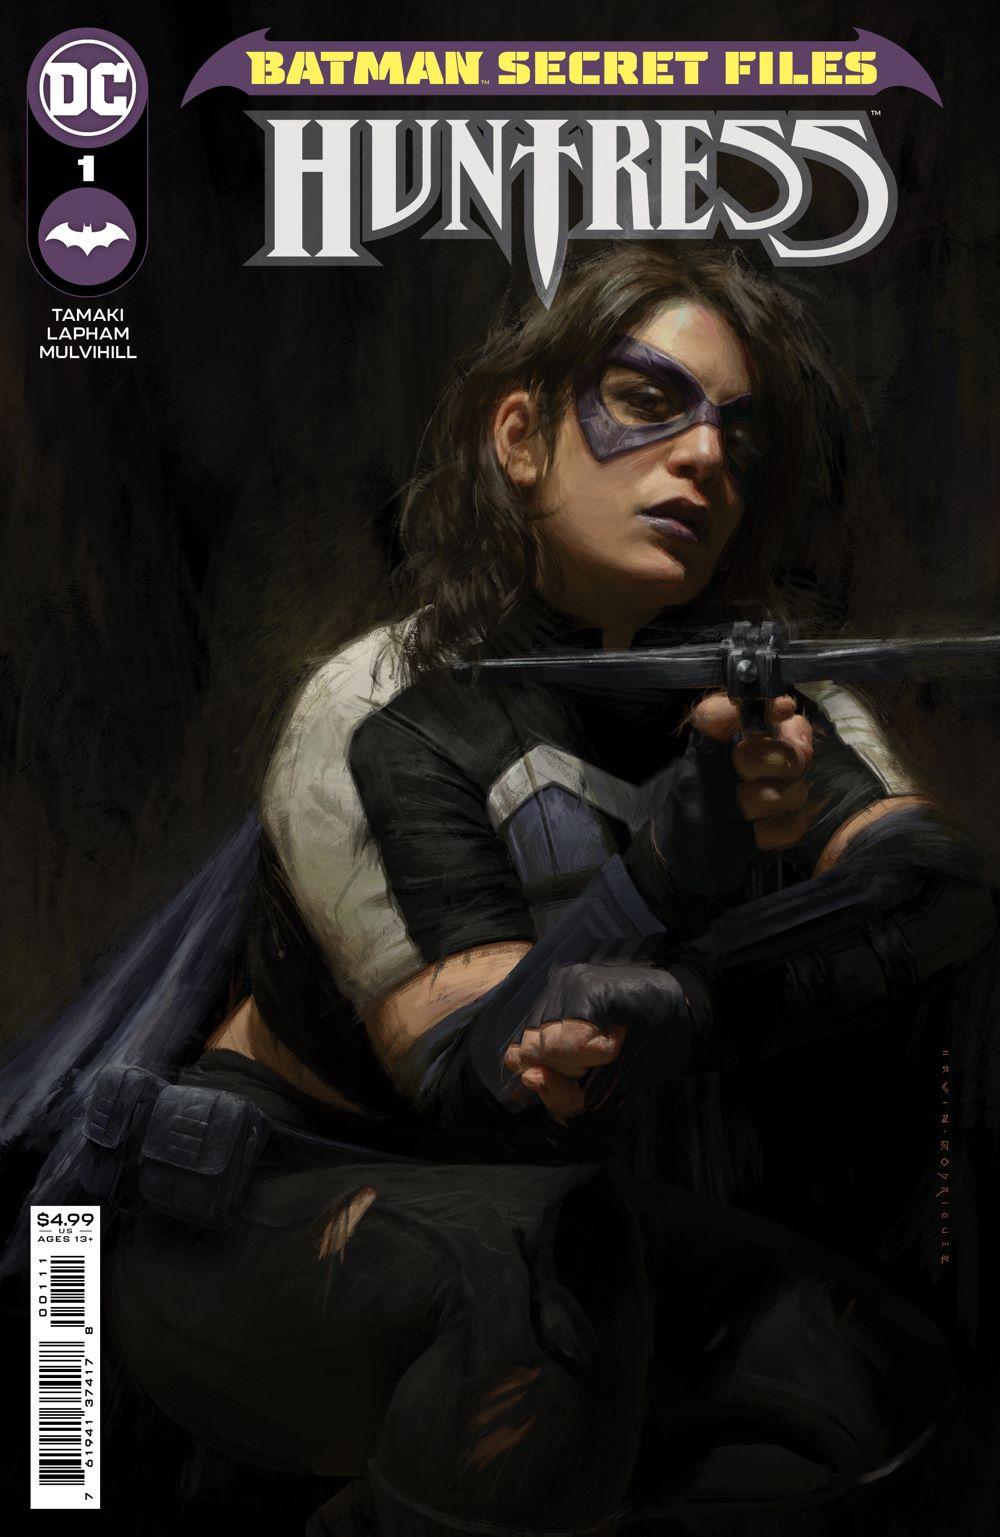 BMSF_HNTRSS_Cv1 DC Comics July 2021 Solicitations